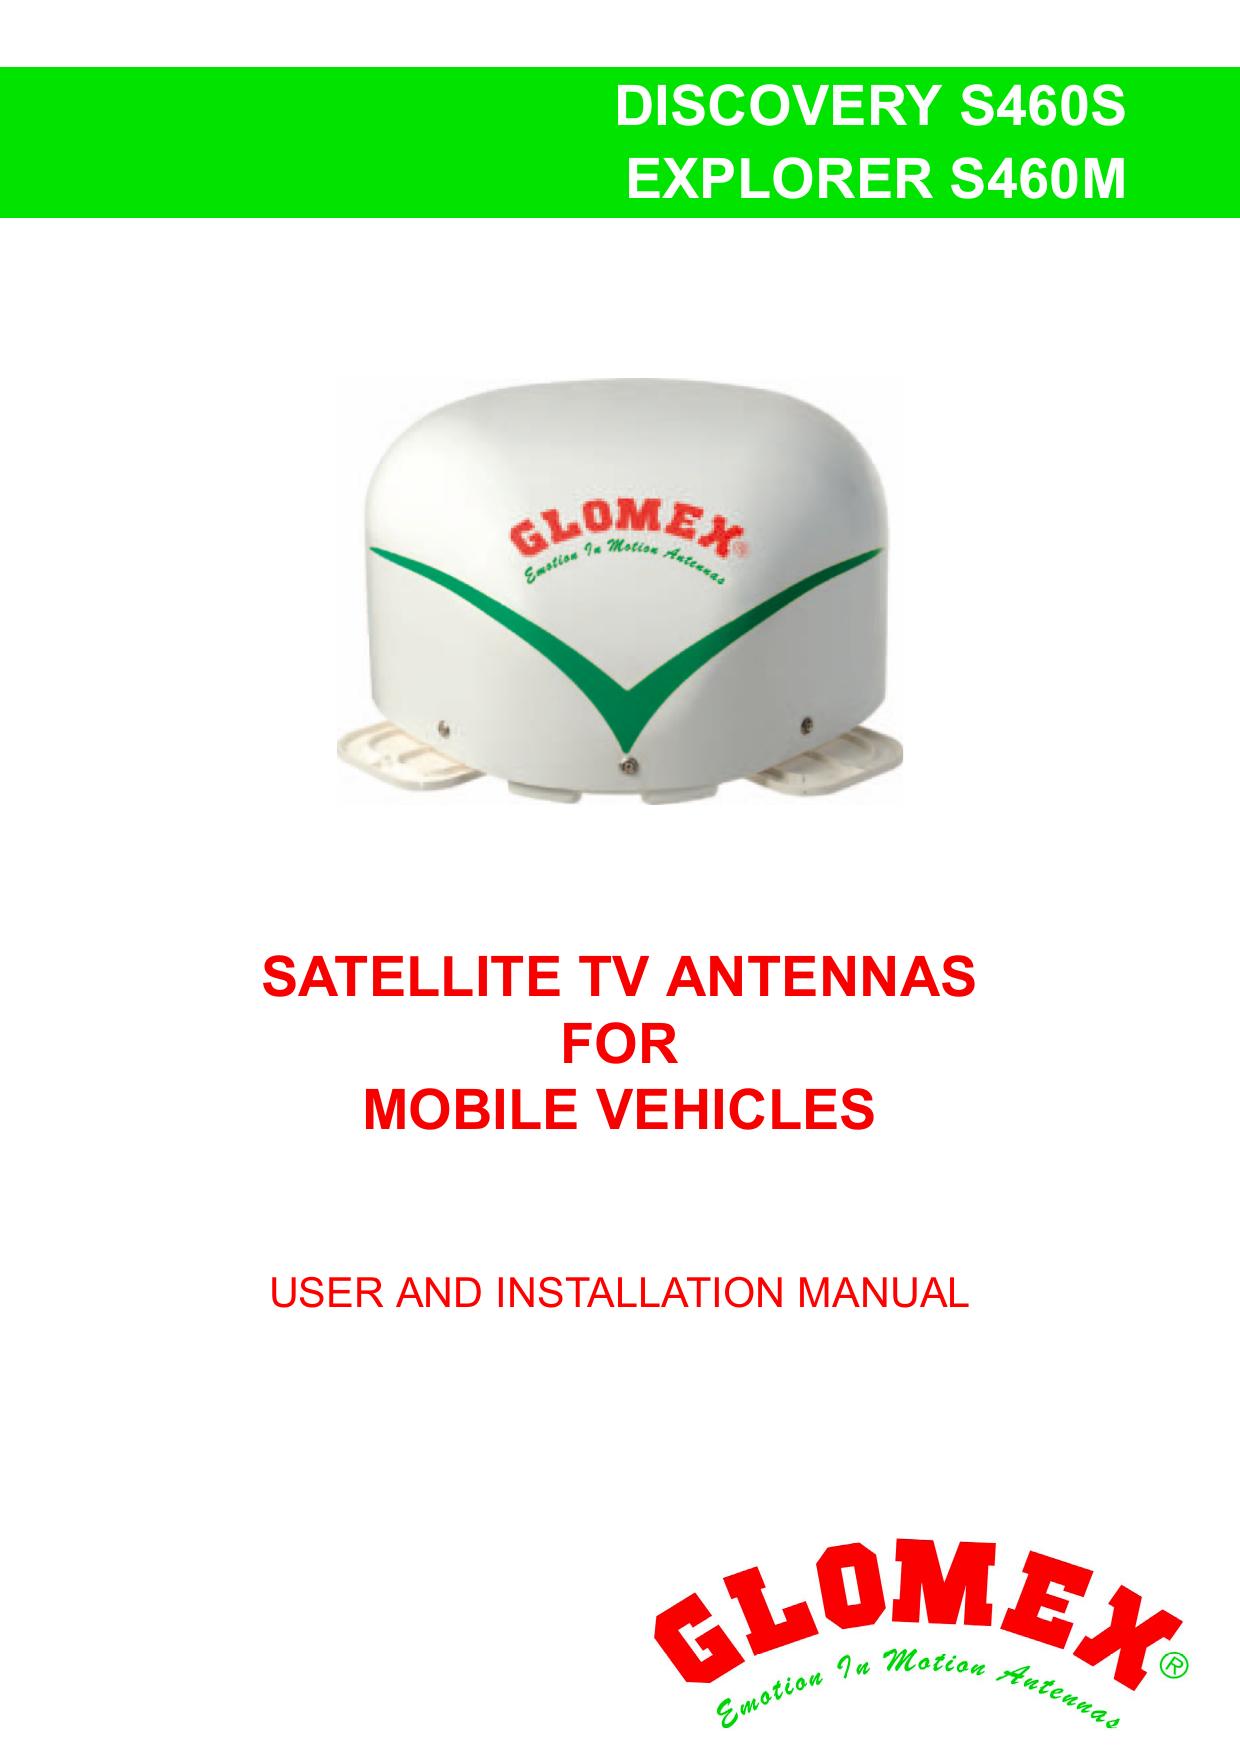 discovery s460s explorer s460m satellite tv antennas for